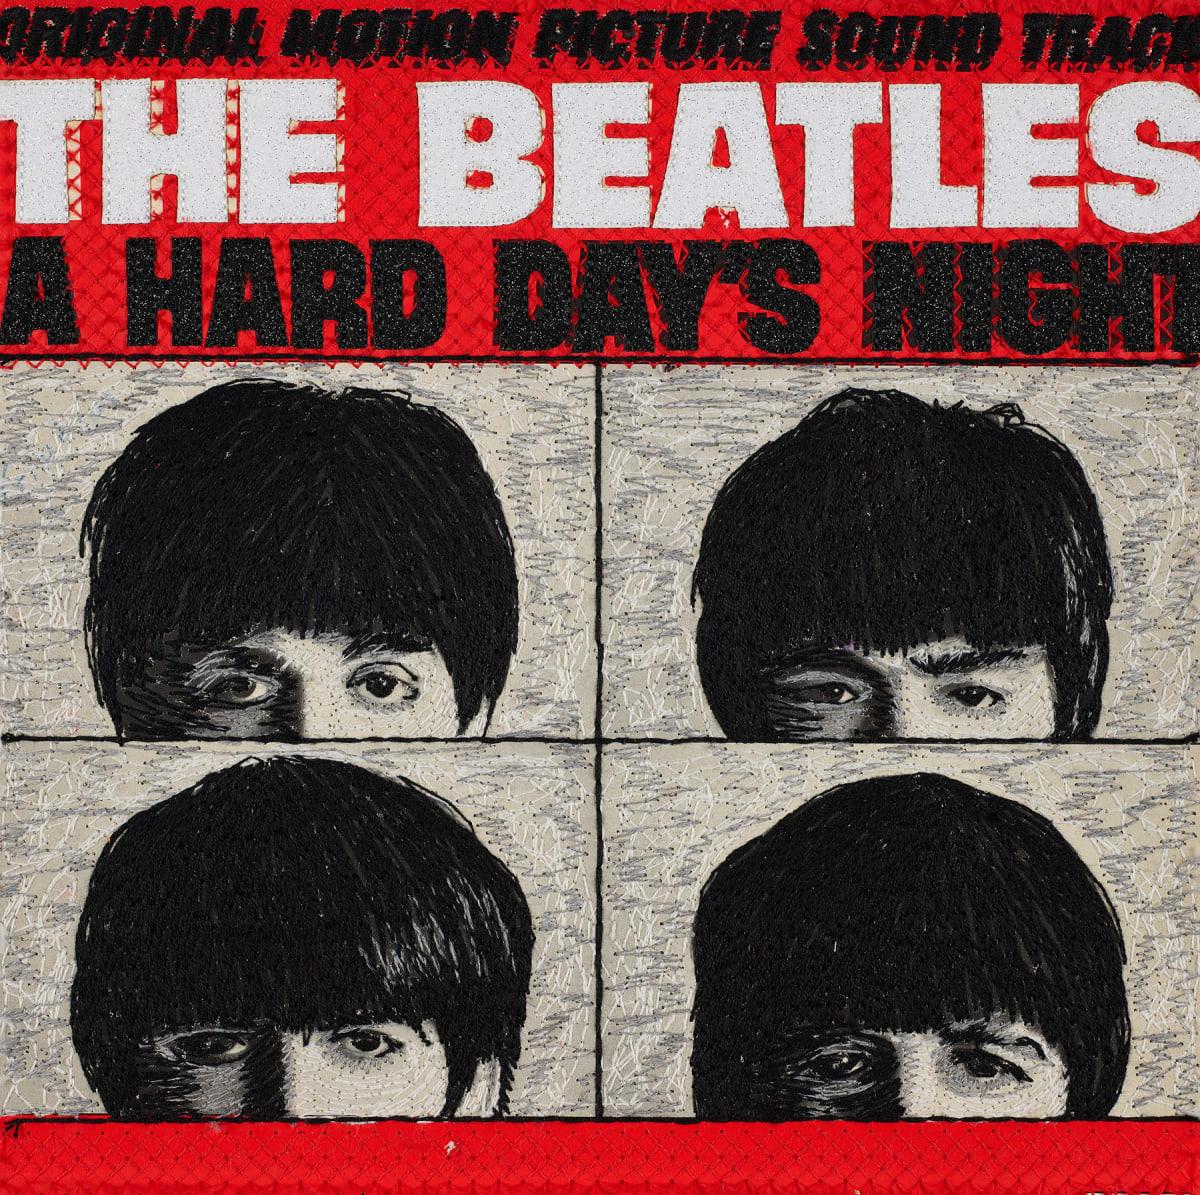 Stephen Wilson, A Hard Day's Night, The Beatles, 2019